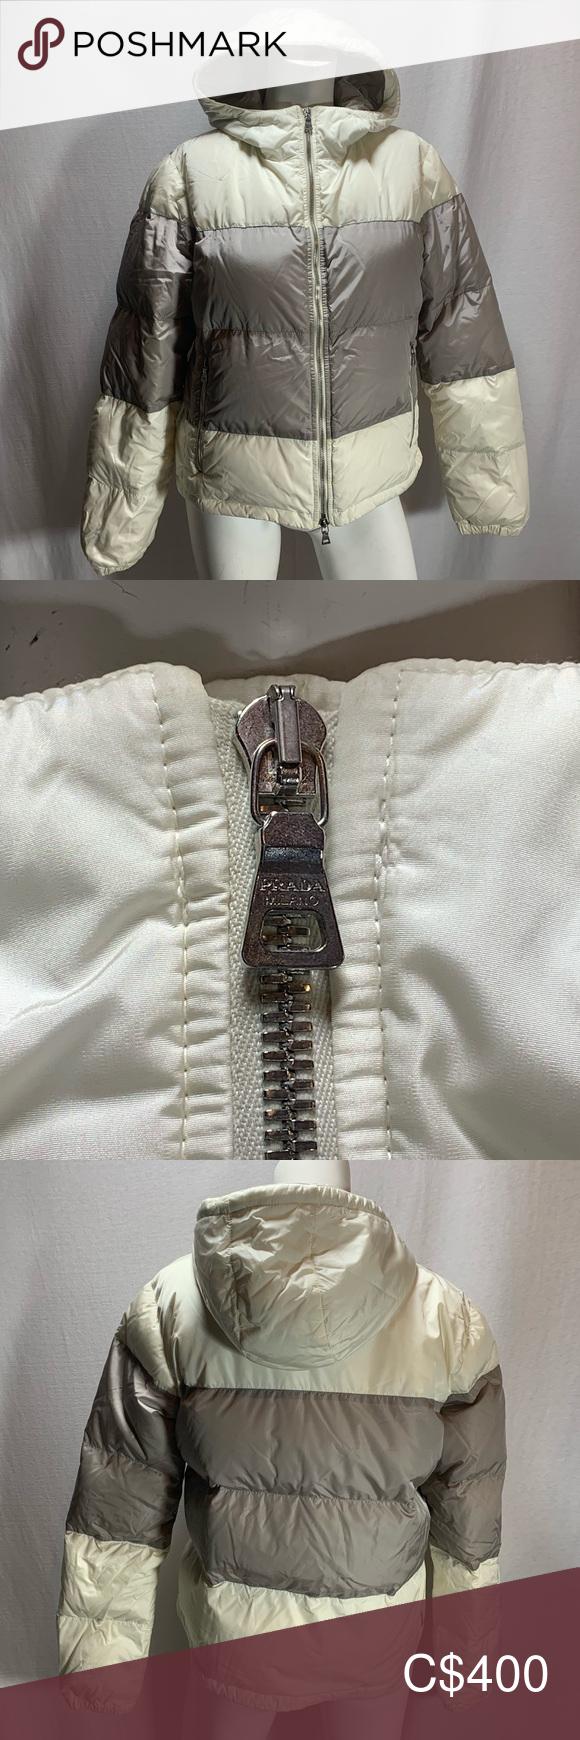 Prada Down Coat Puffer Ski Jacket S M Cream Gray Prada Ski Jacket Puffer Coat Down Filled Cream And Gray Fits Medium Large Co Ski Jacket Down Coat Jackets [ 1740 x 580 Pixel ]